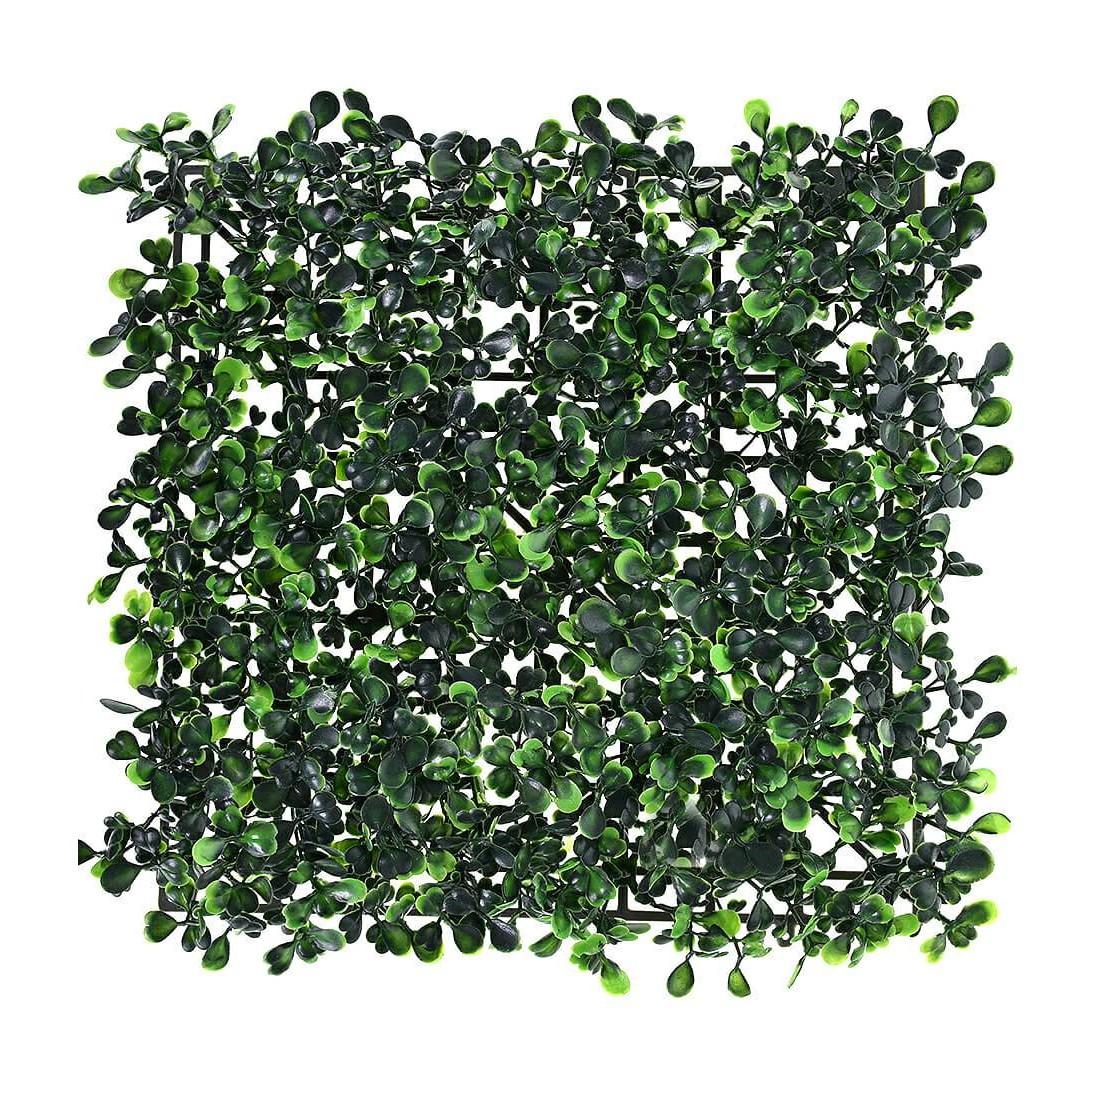 Grama Artificial 25x25cm Verde - GPresentes